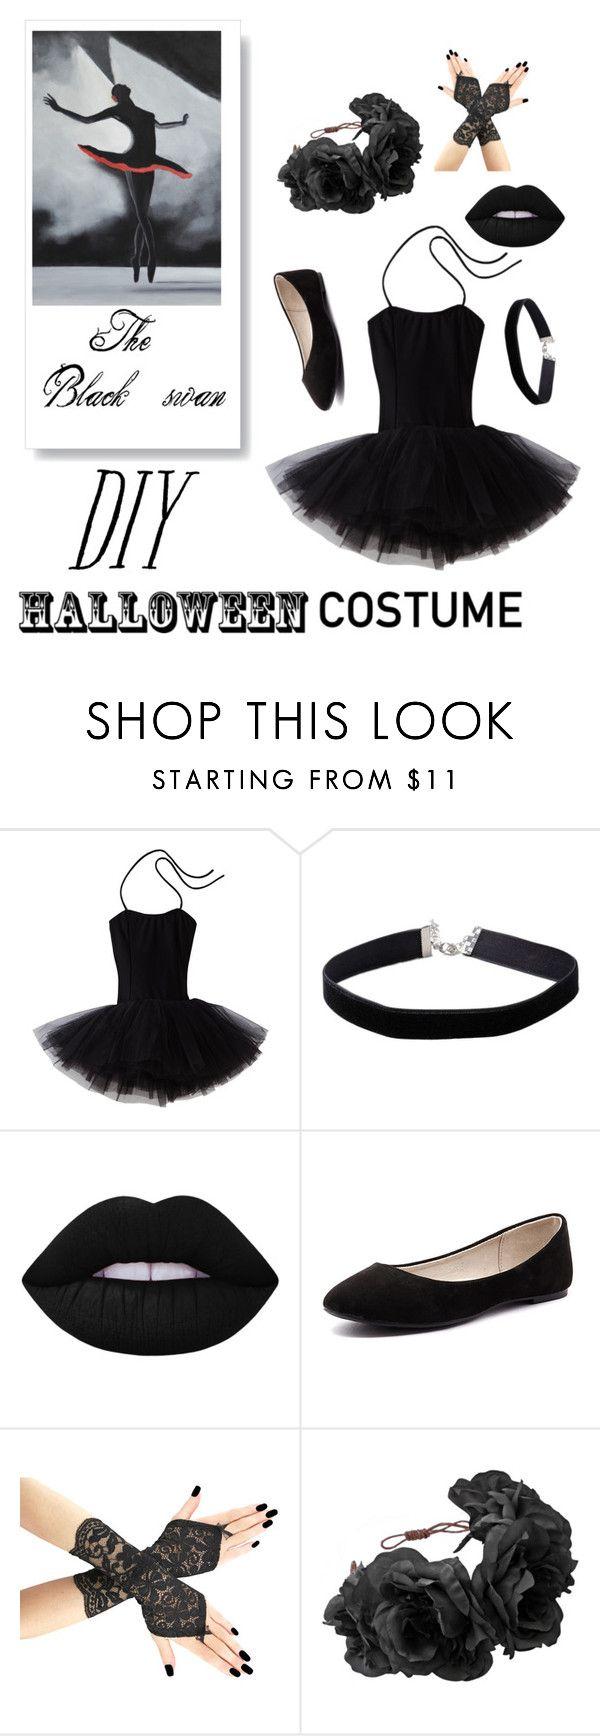 """DIY black swan Halloween costume"" by emilythejester ❤ liked on Polyvore featuring Sansha, Miss Selfridge, Lime Crime, Verali and Rock 'N Rose"